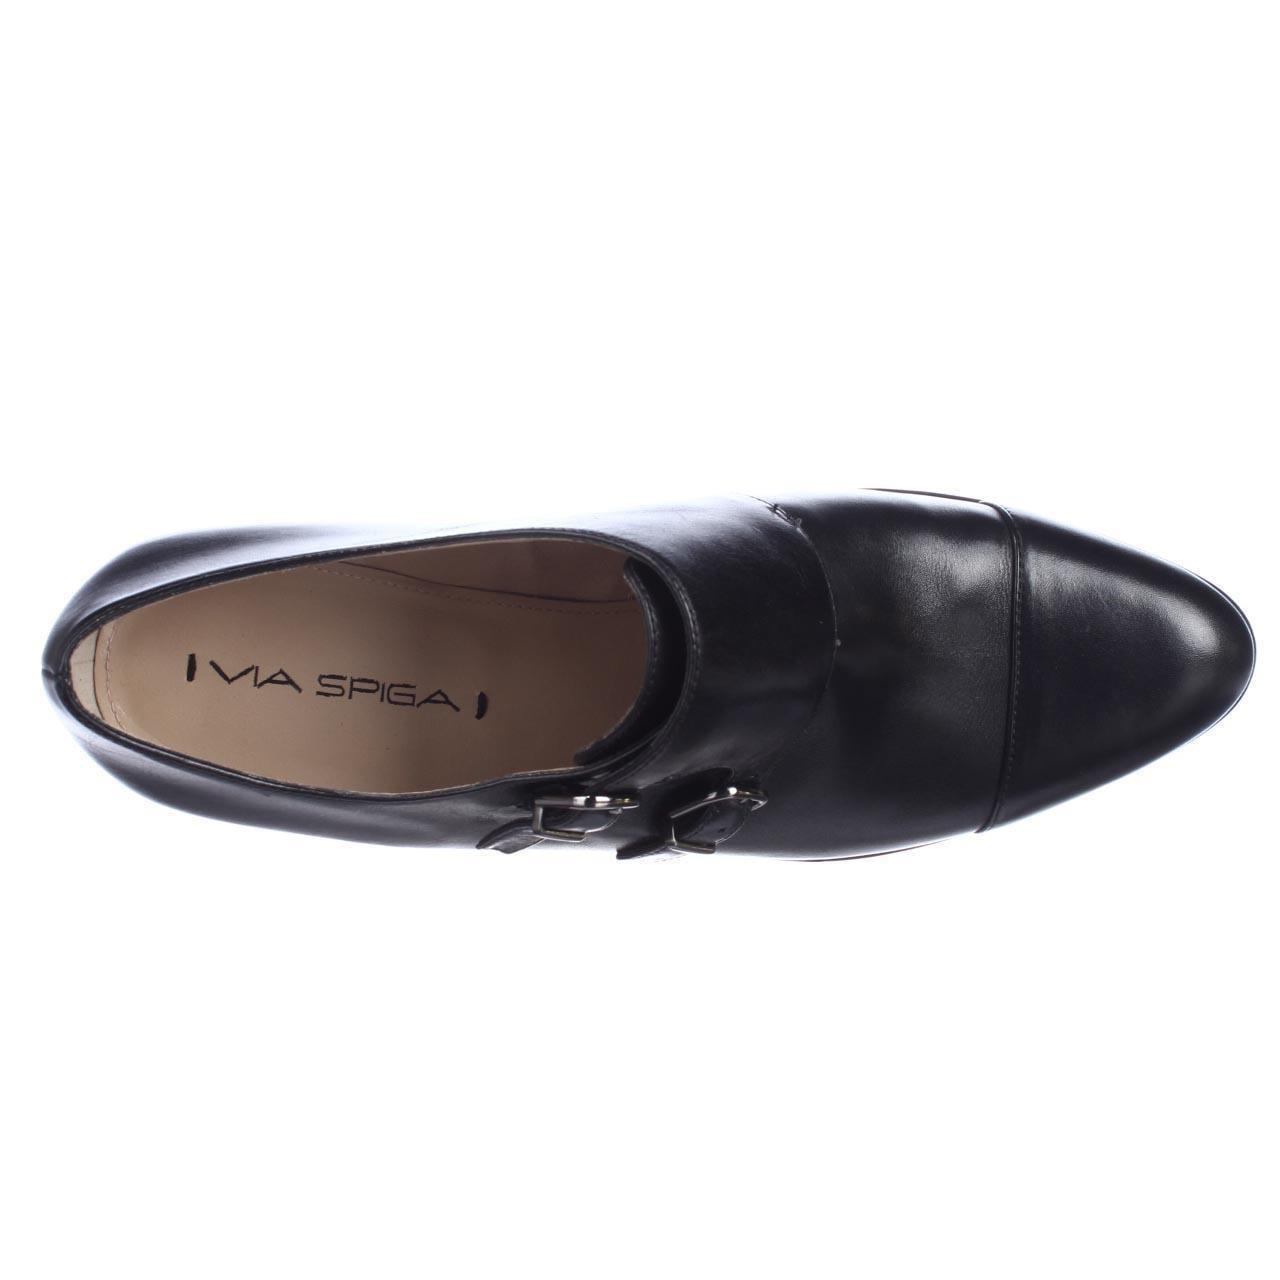 Womens Via Spiga Black, Cielo Sleek Buckle Oxfords, Black, Spiga 9.5 US 583807